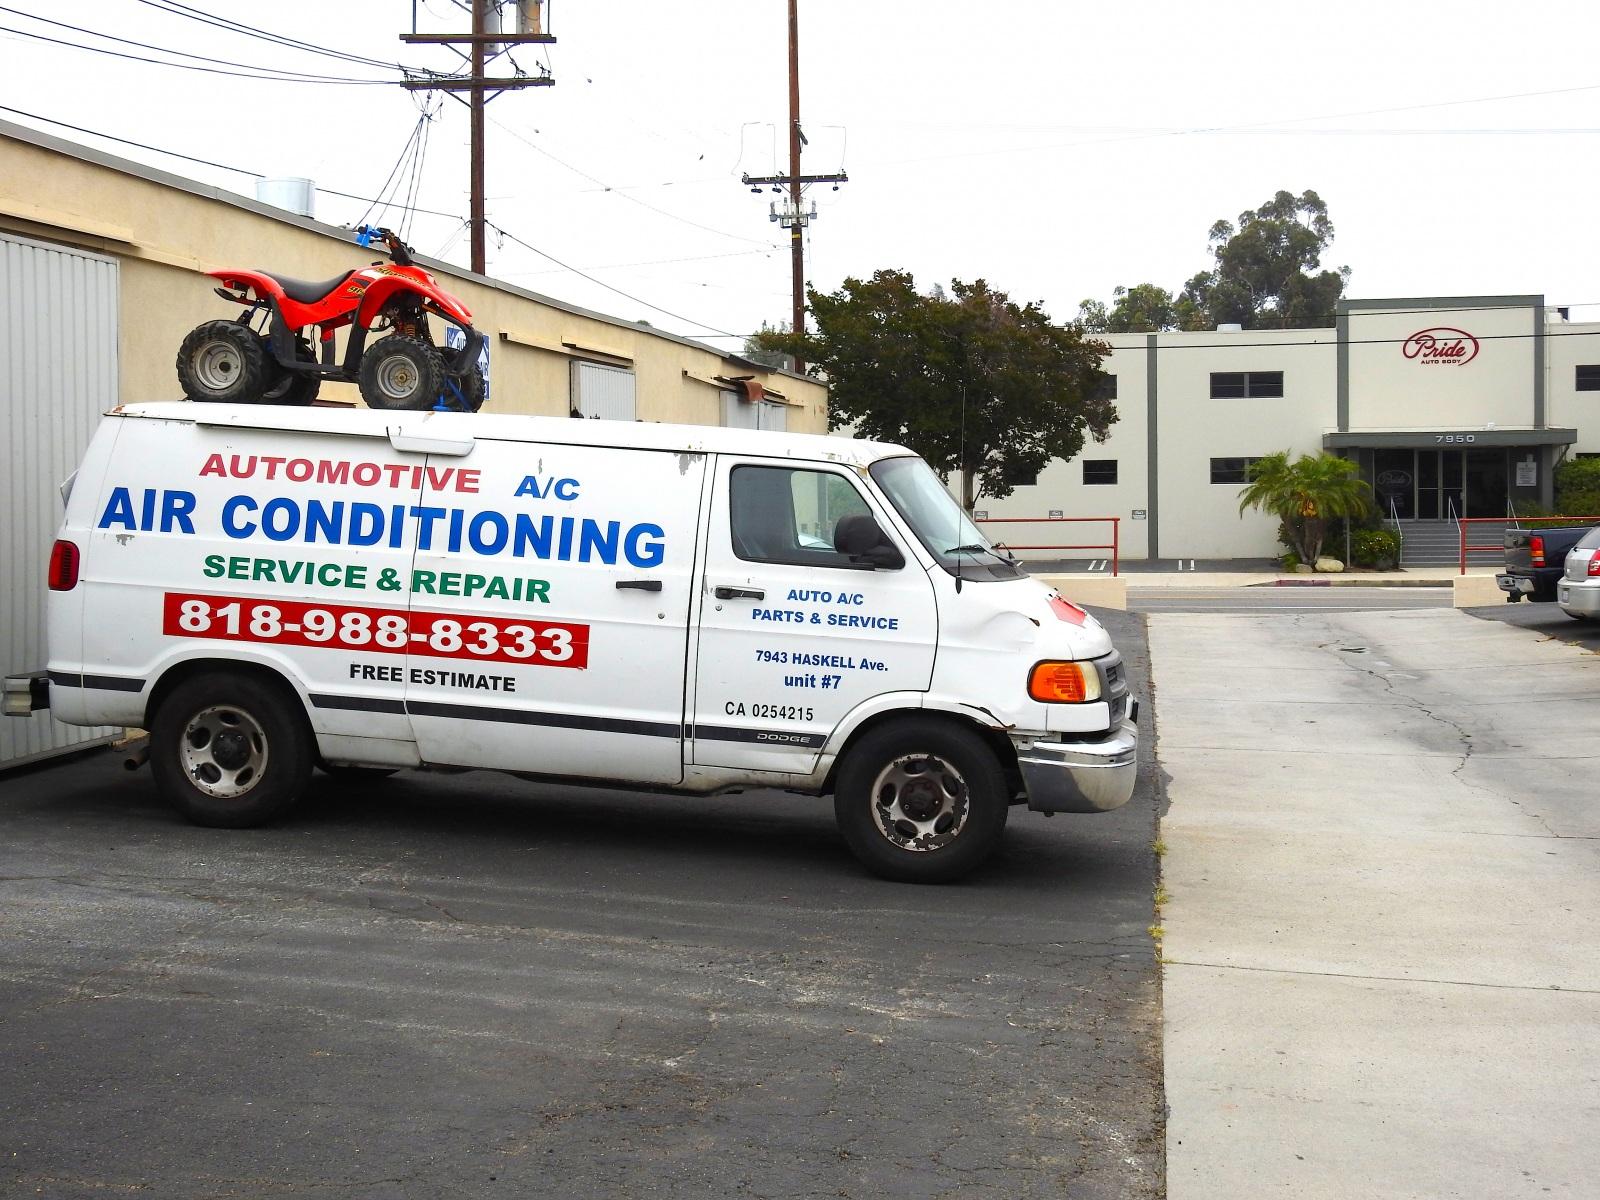 Ben Auto AC – Auto AC Compressors & Automotive Repair in Van Nuys, CA